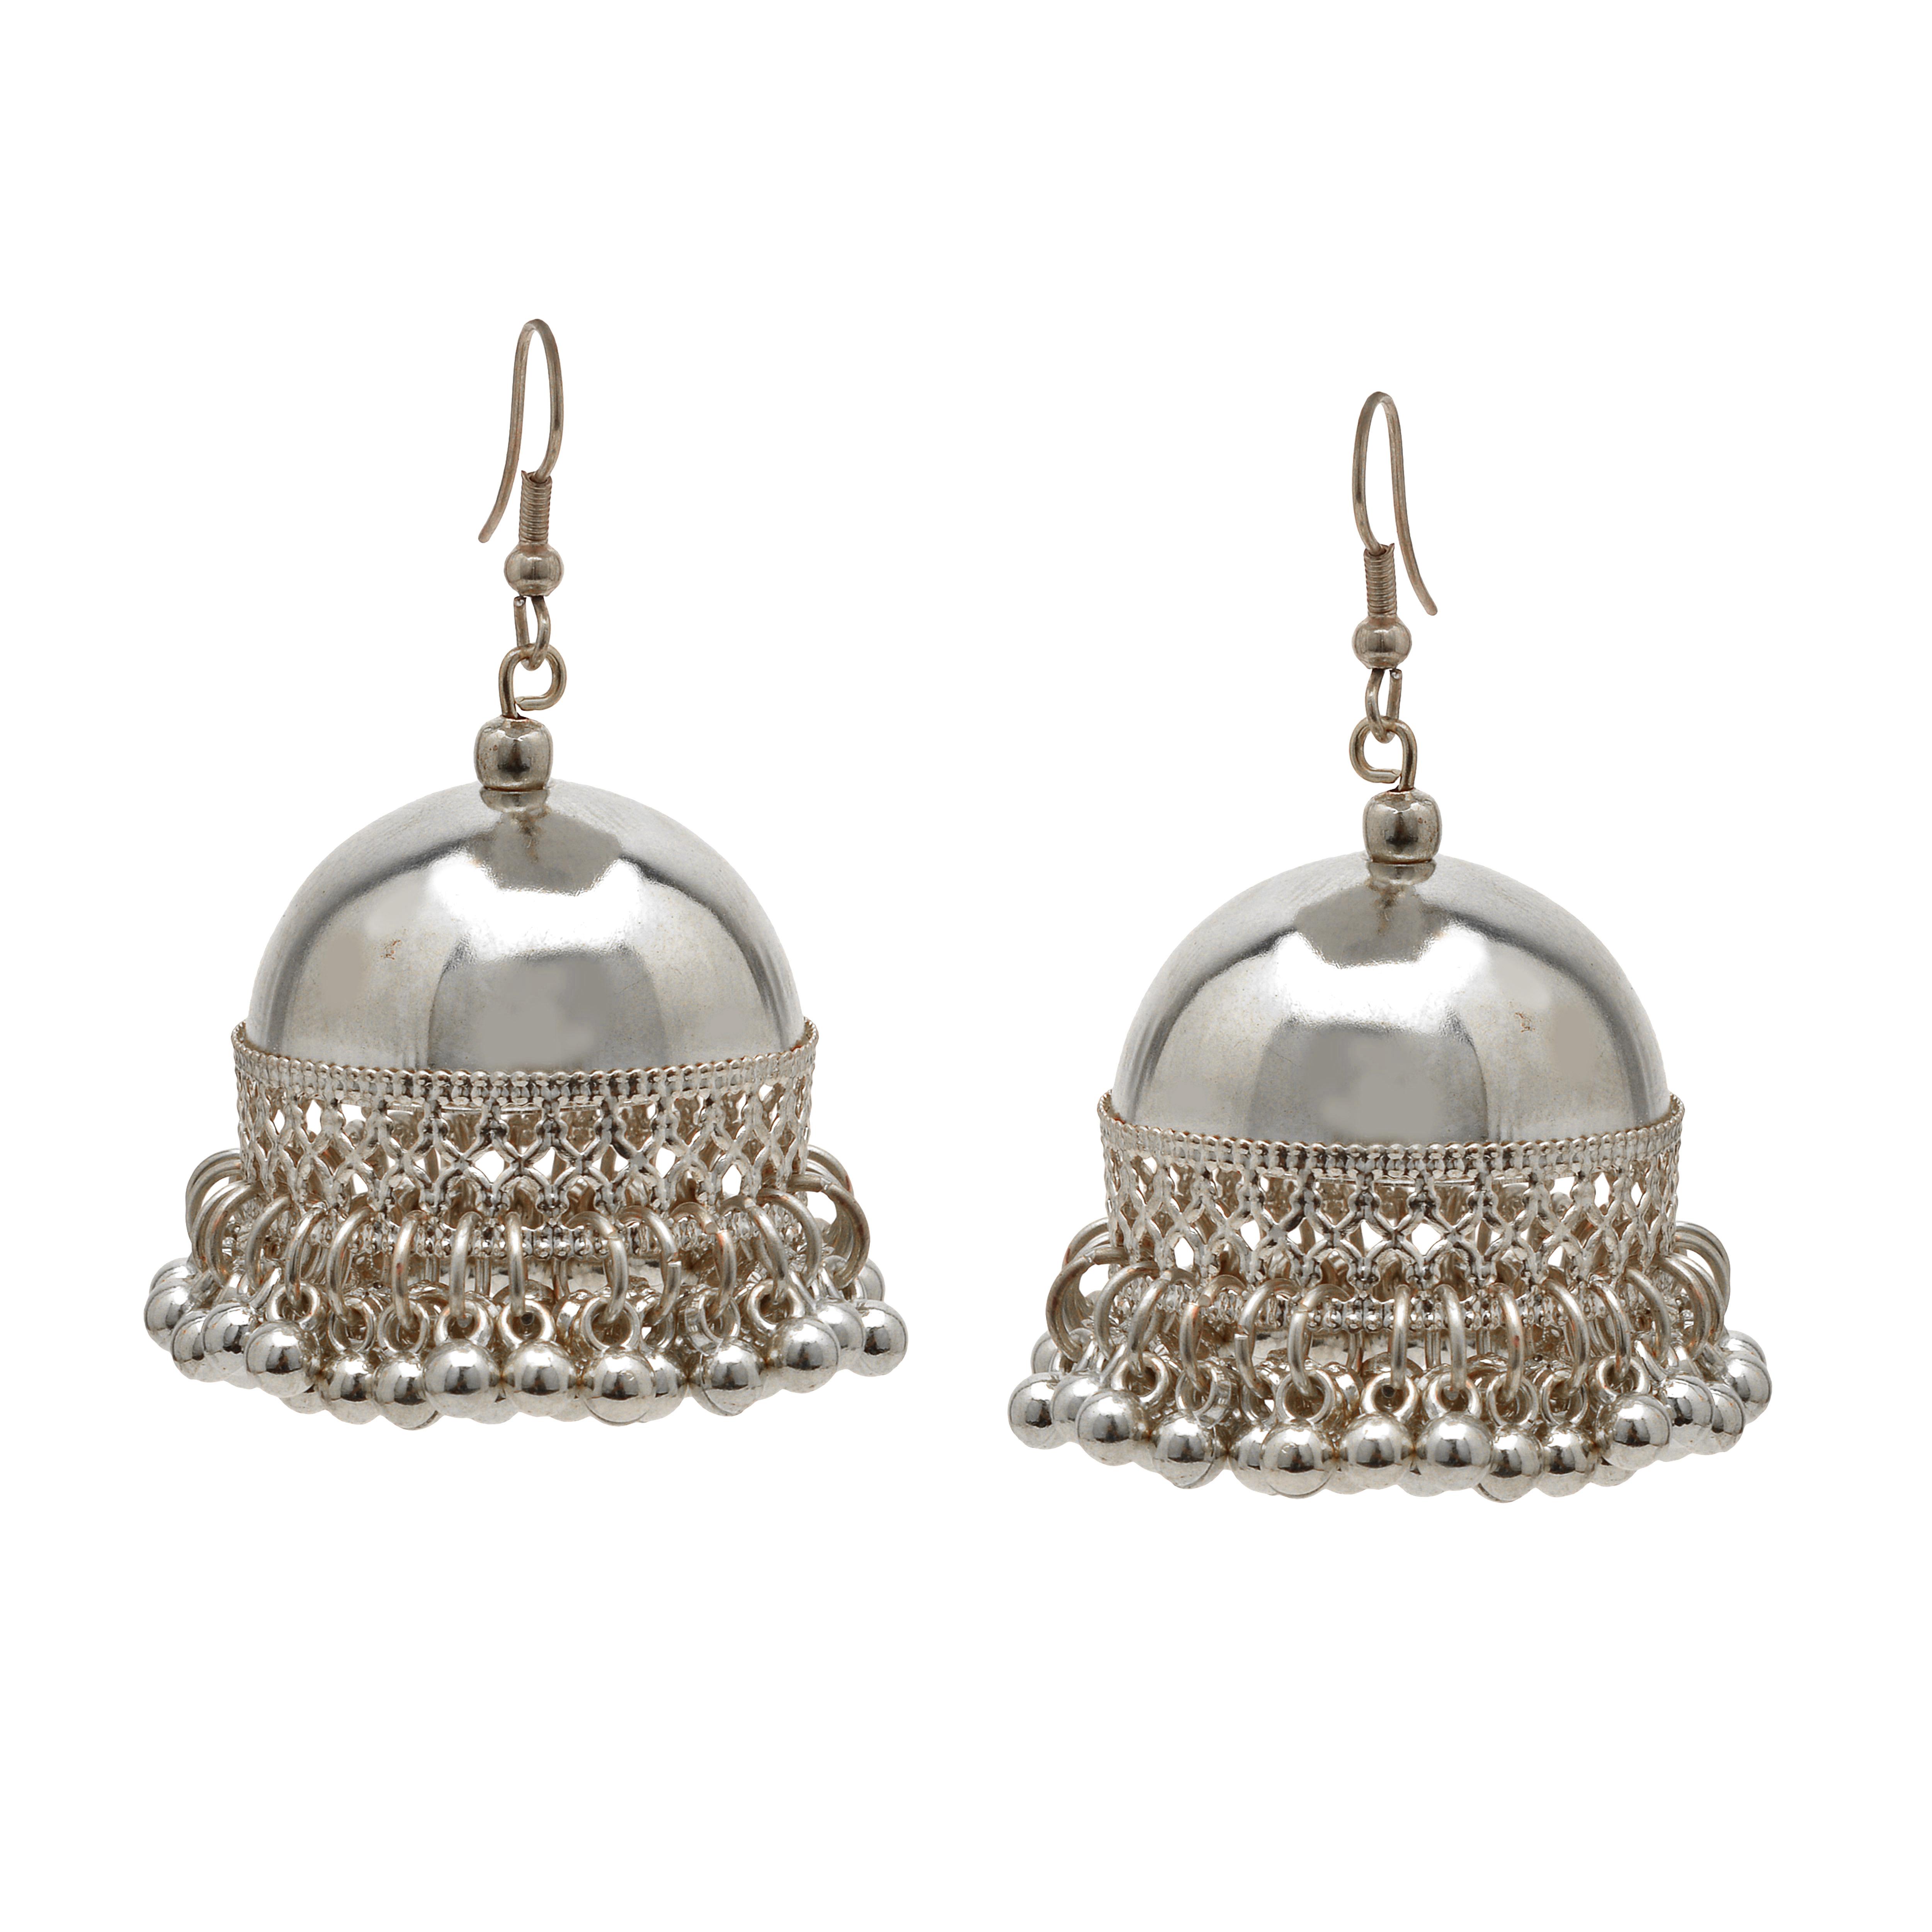 Numame Jhumka Earrings Women S Traditional German Silver Ethnic Dangle Drop Fashion Product On